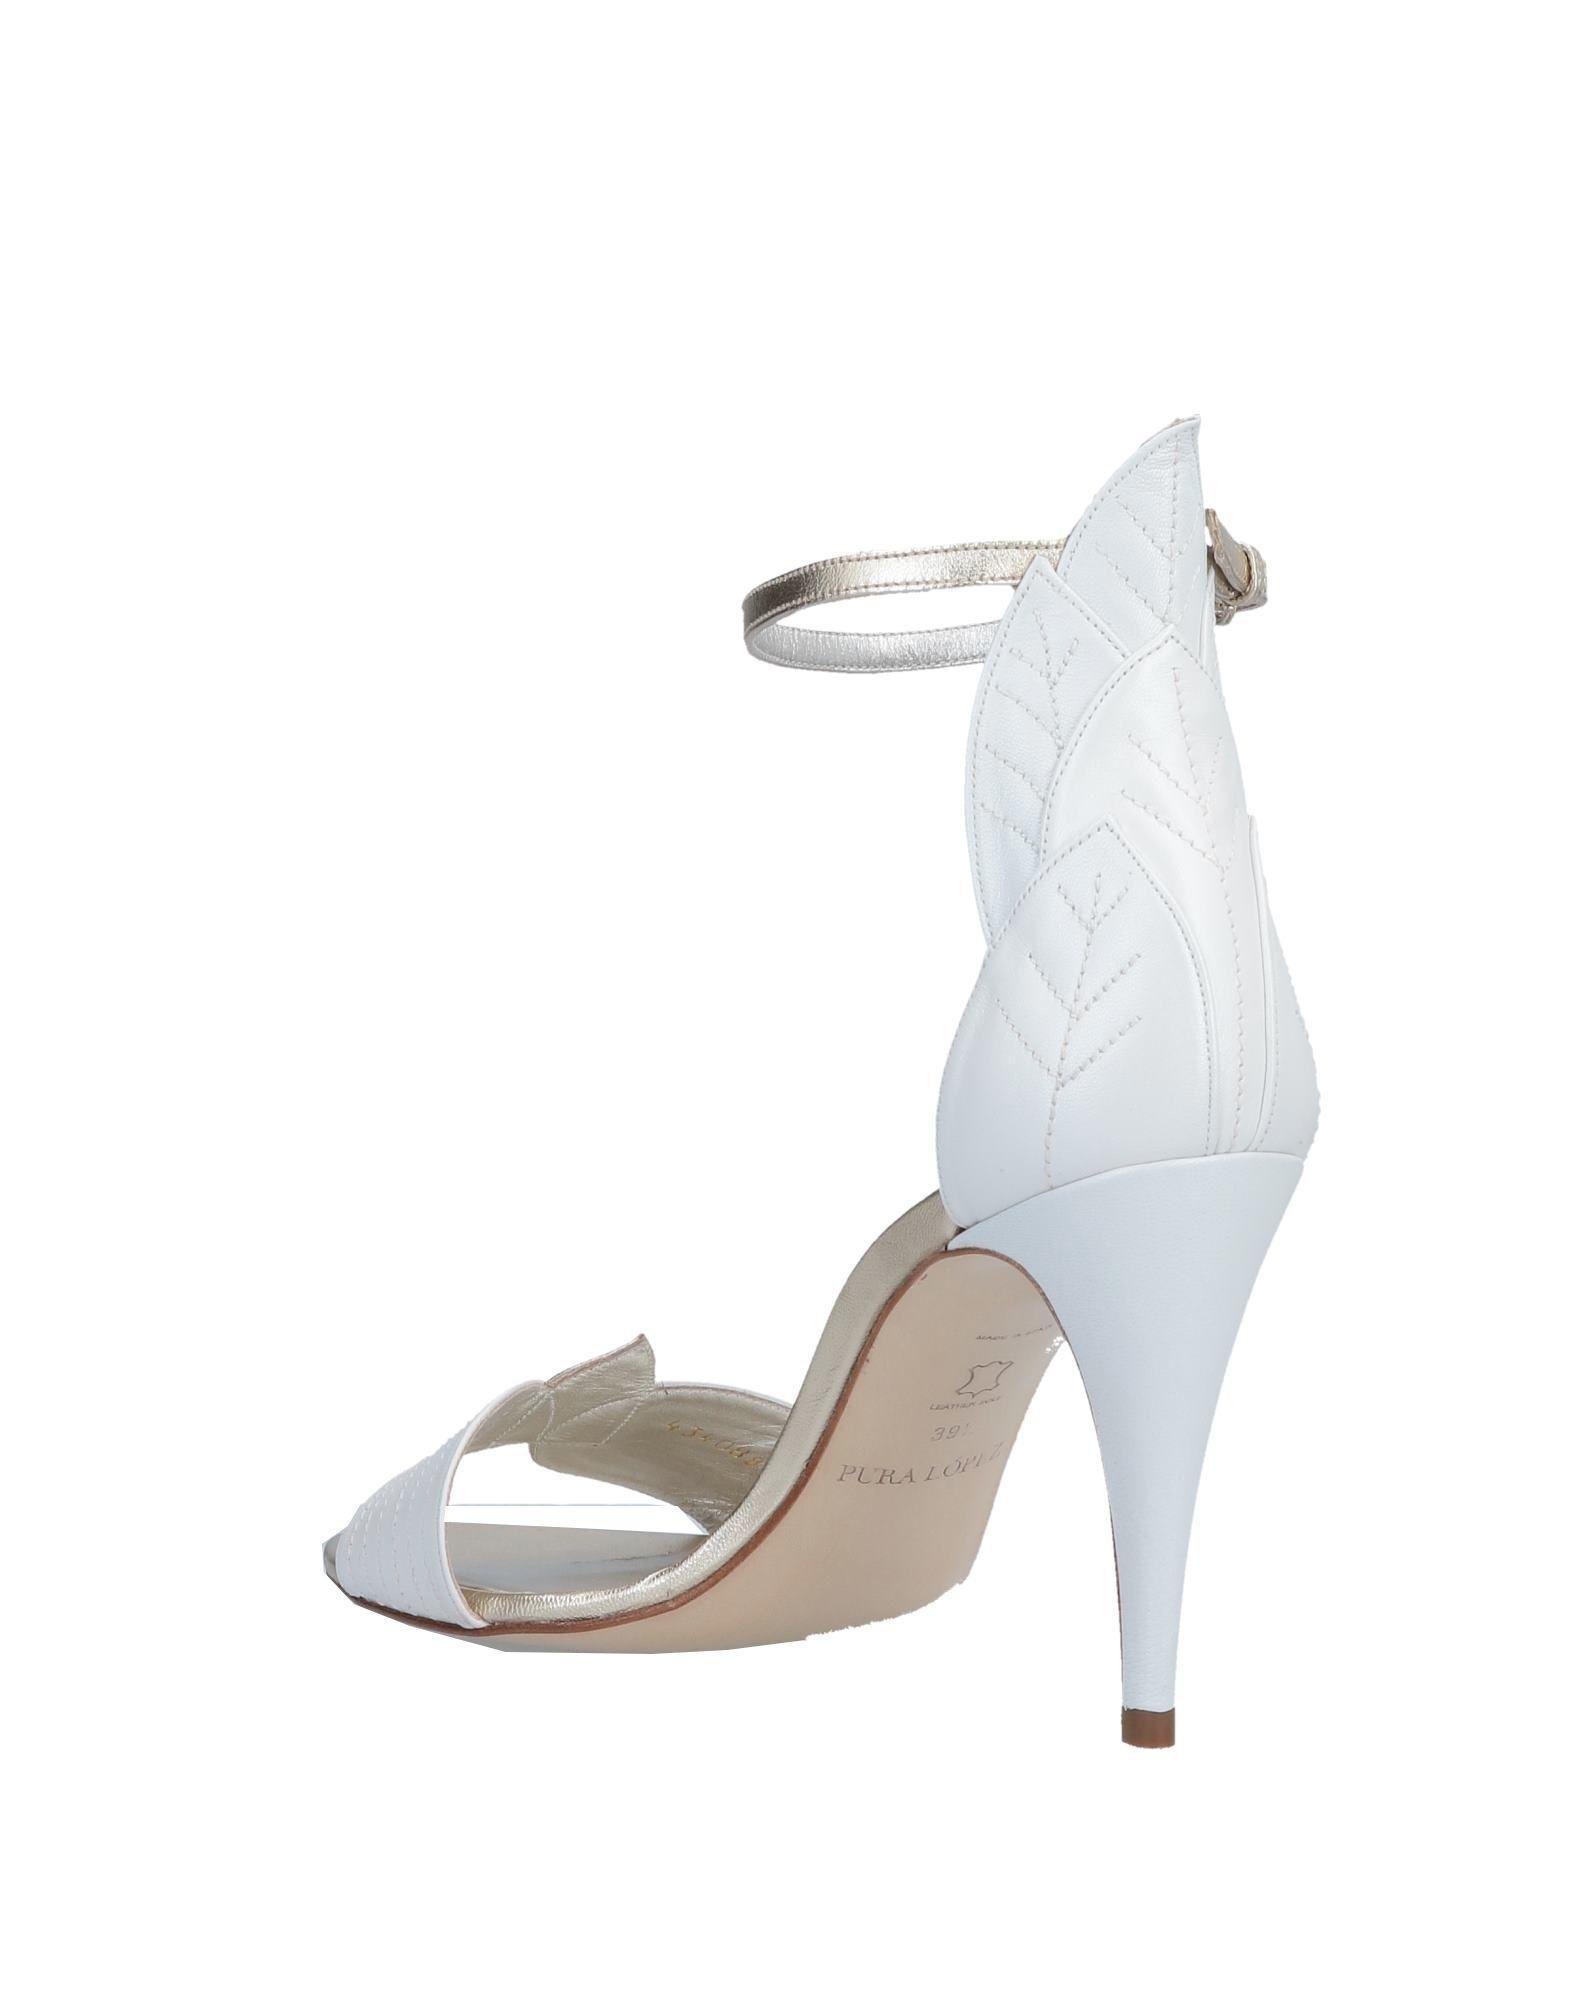 d38df59295c Pura Lopez Sandals in White - Lyst